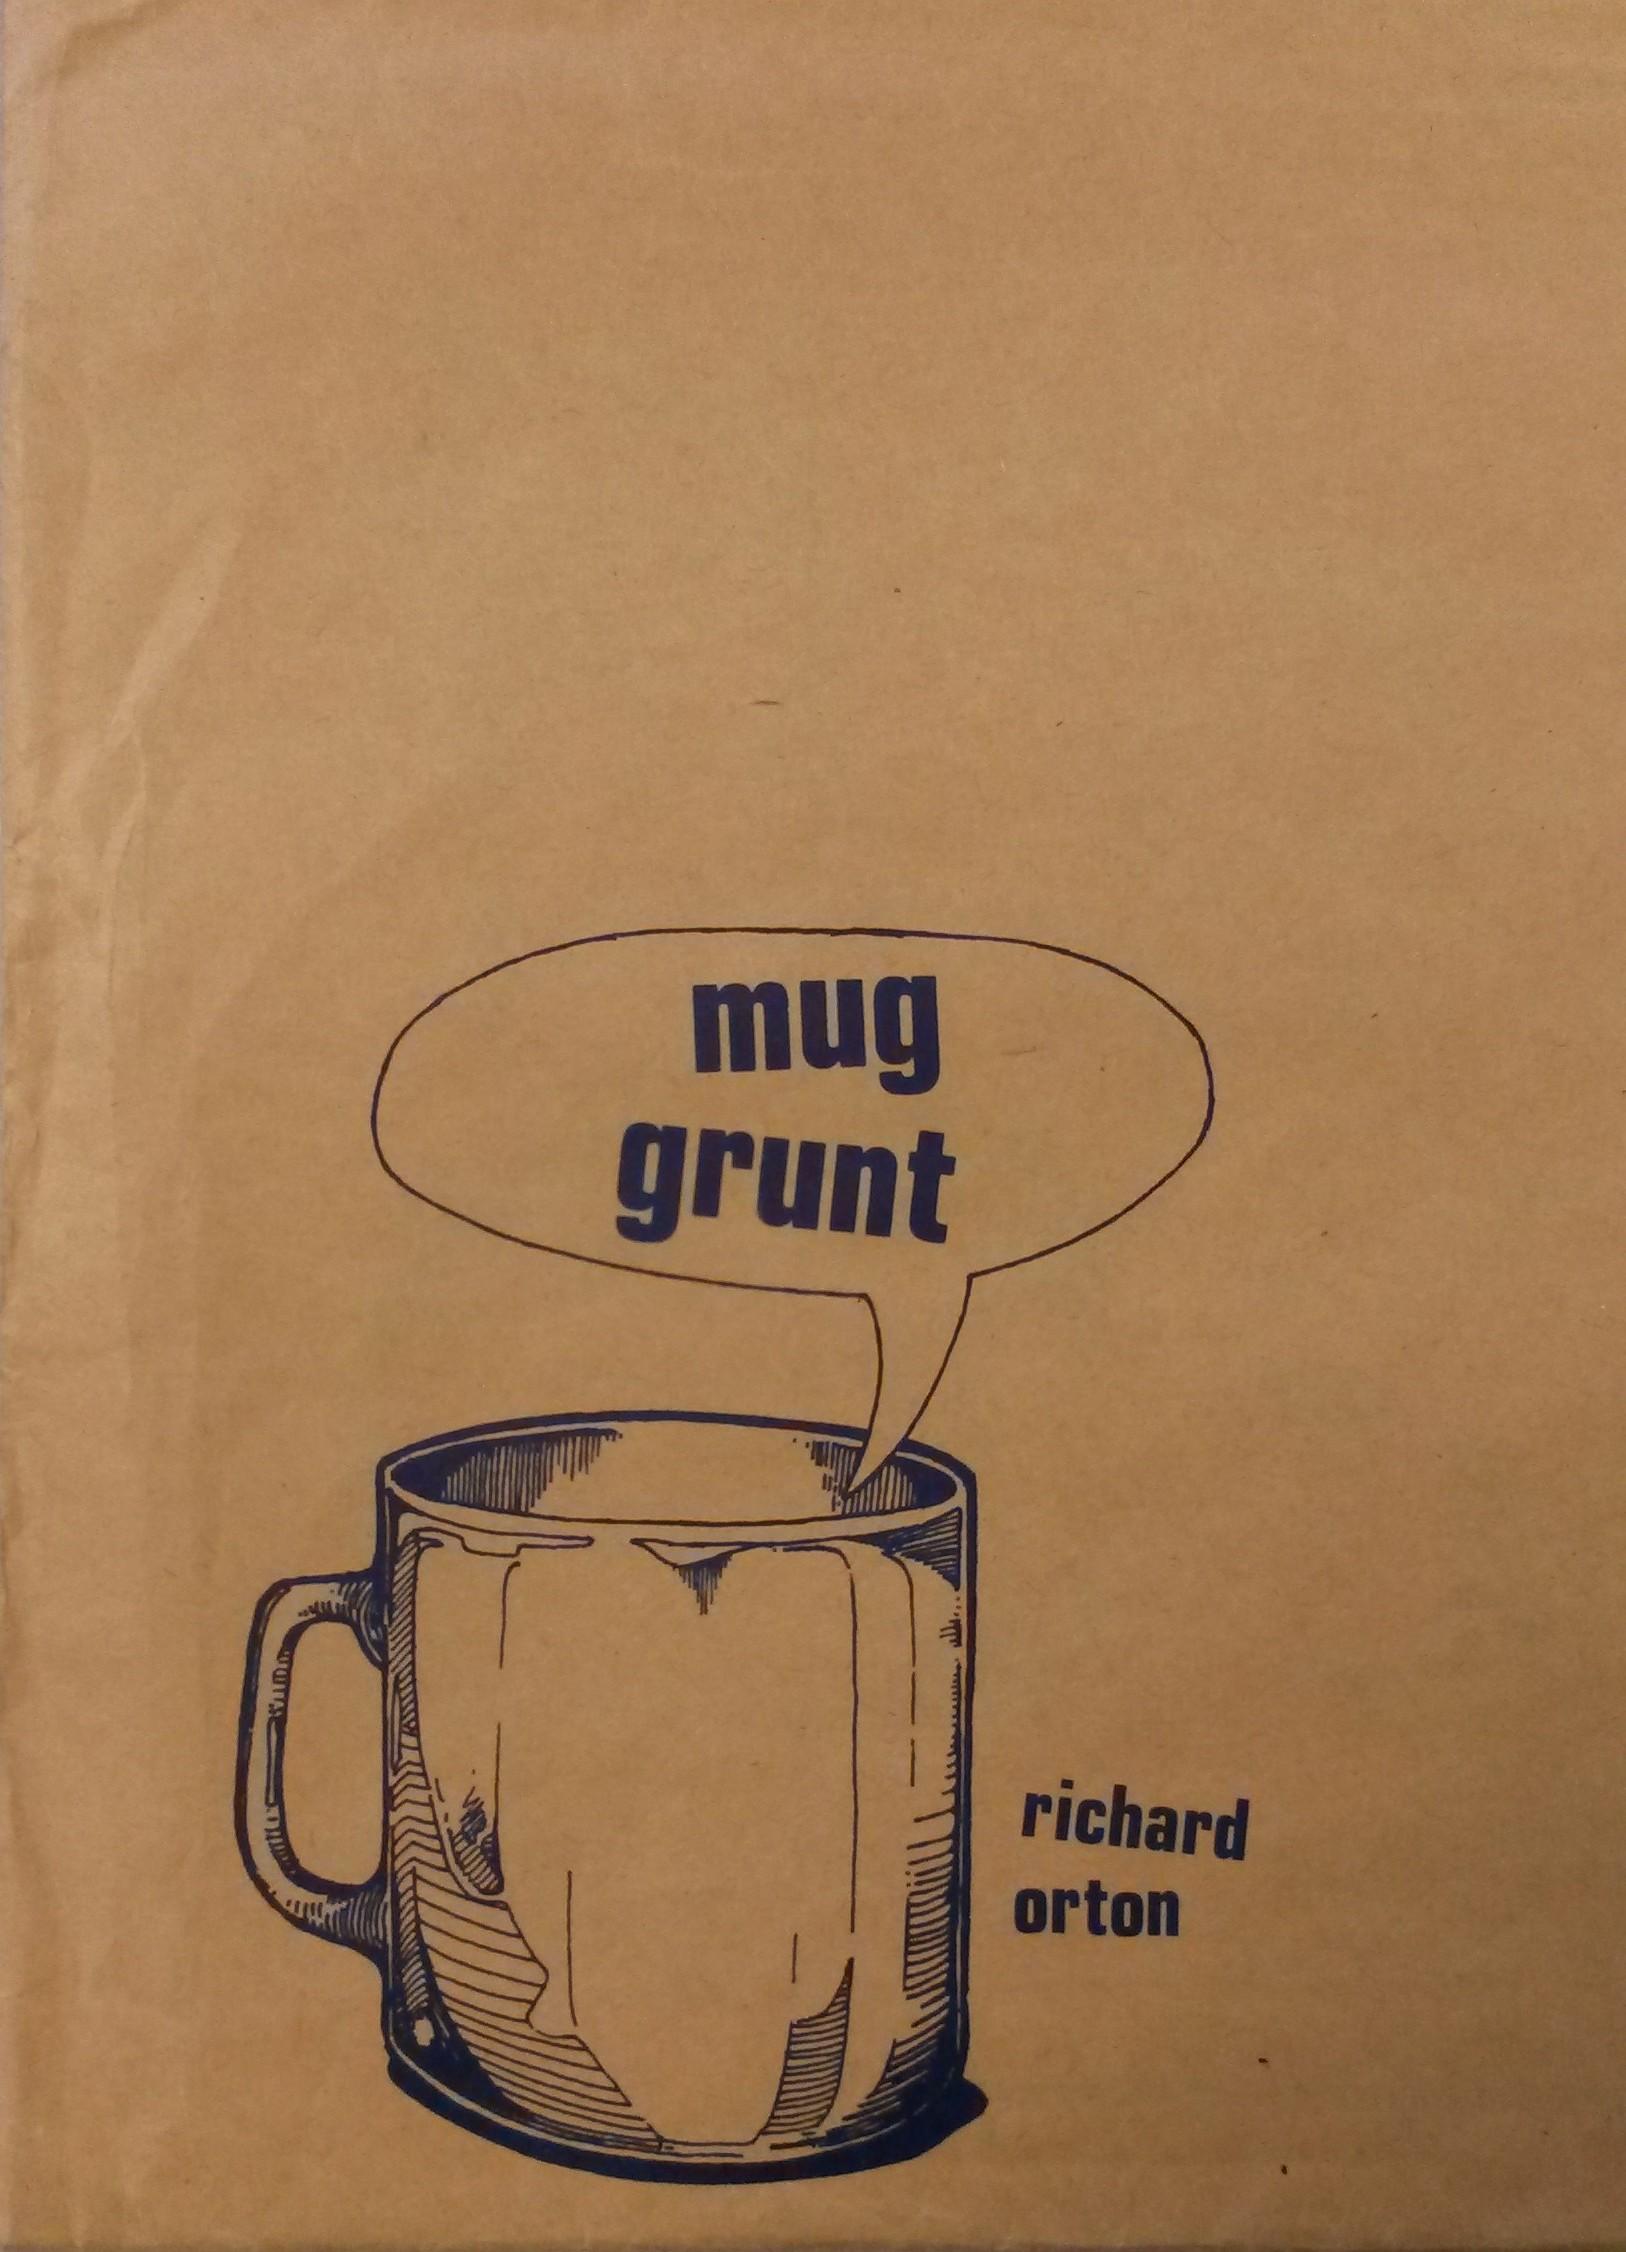 Mug grunt by Richard Orton